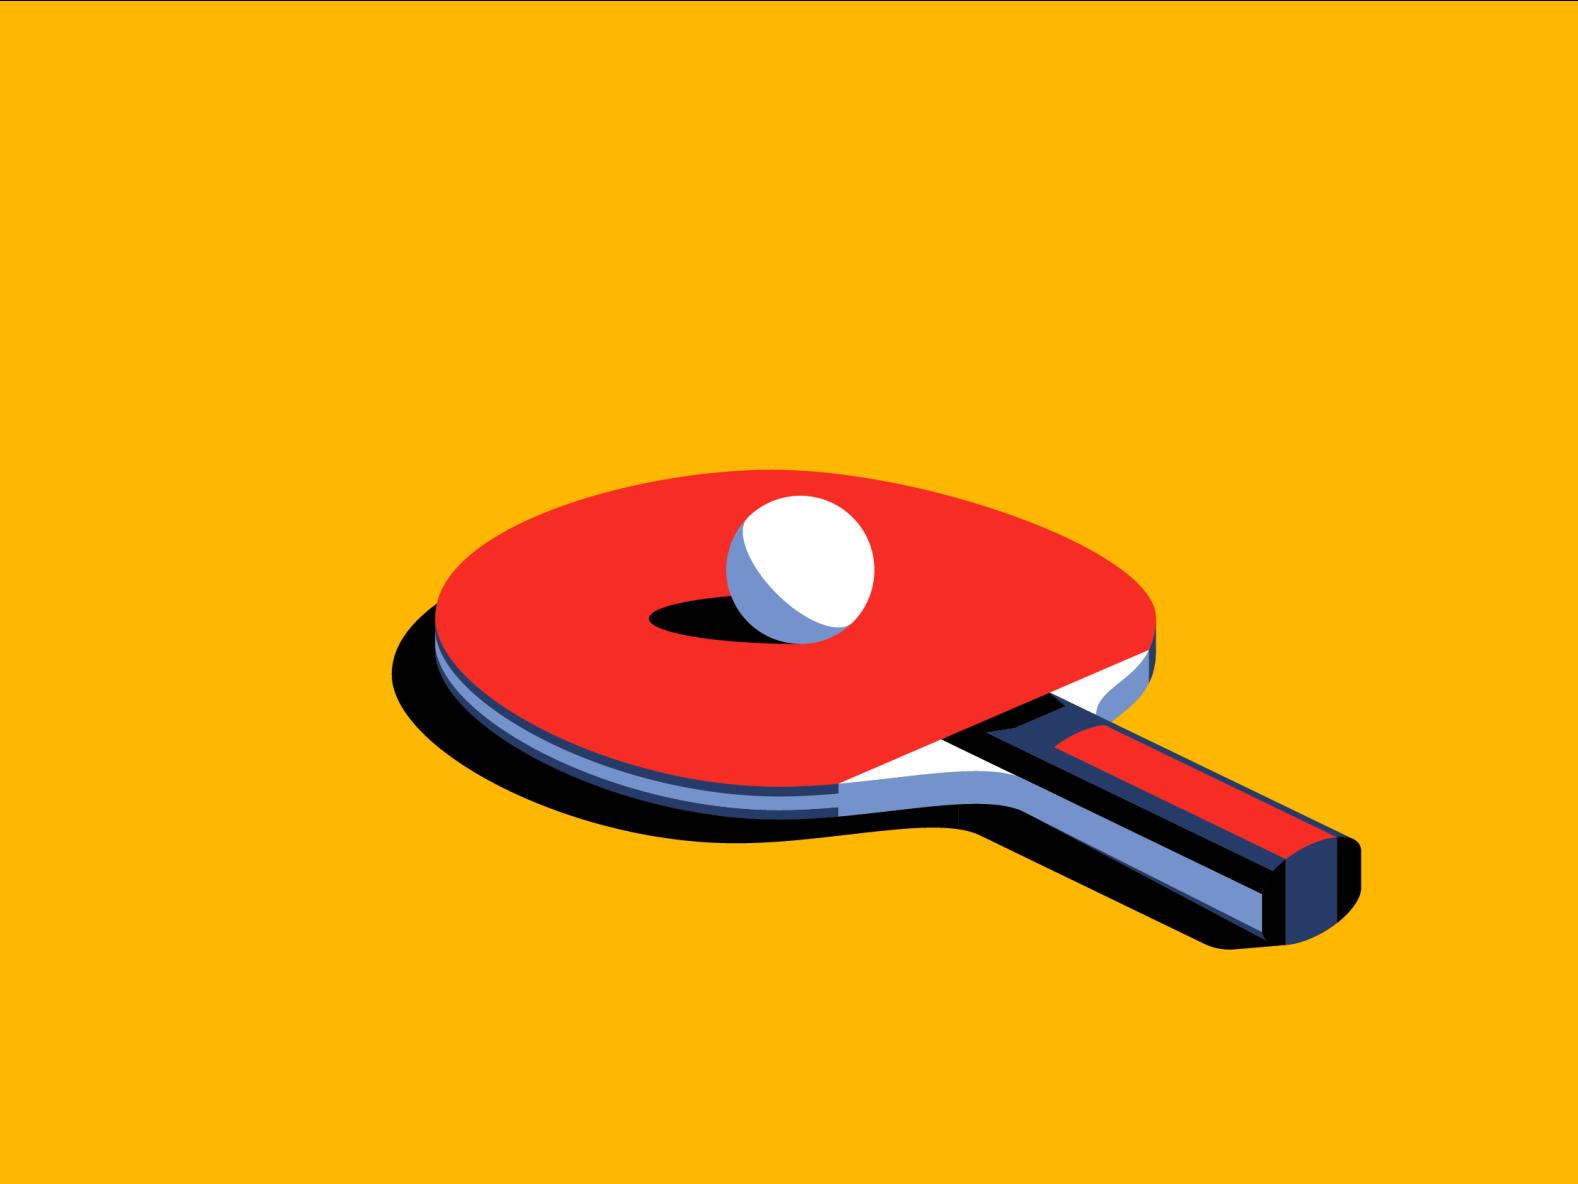 Ping Pong Ping Pong Pong Table Tennis